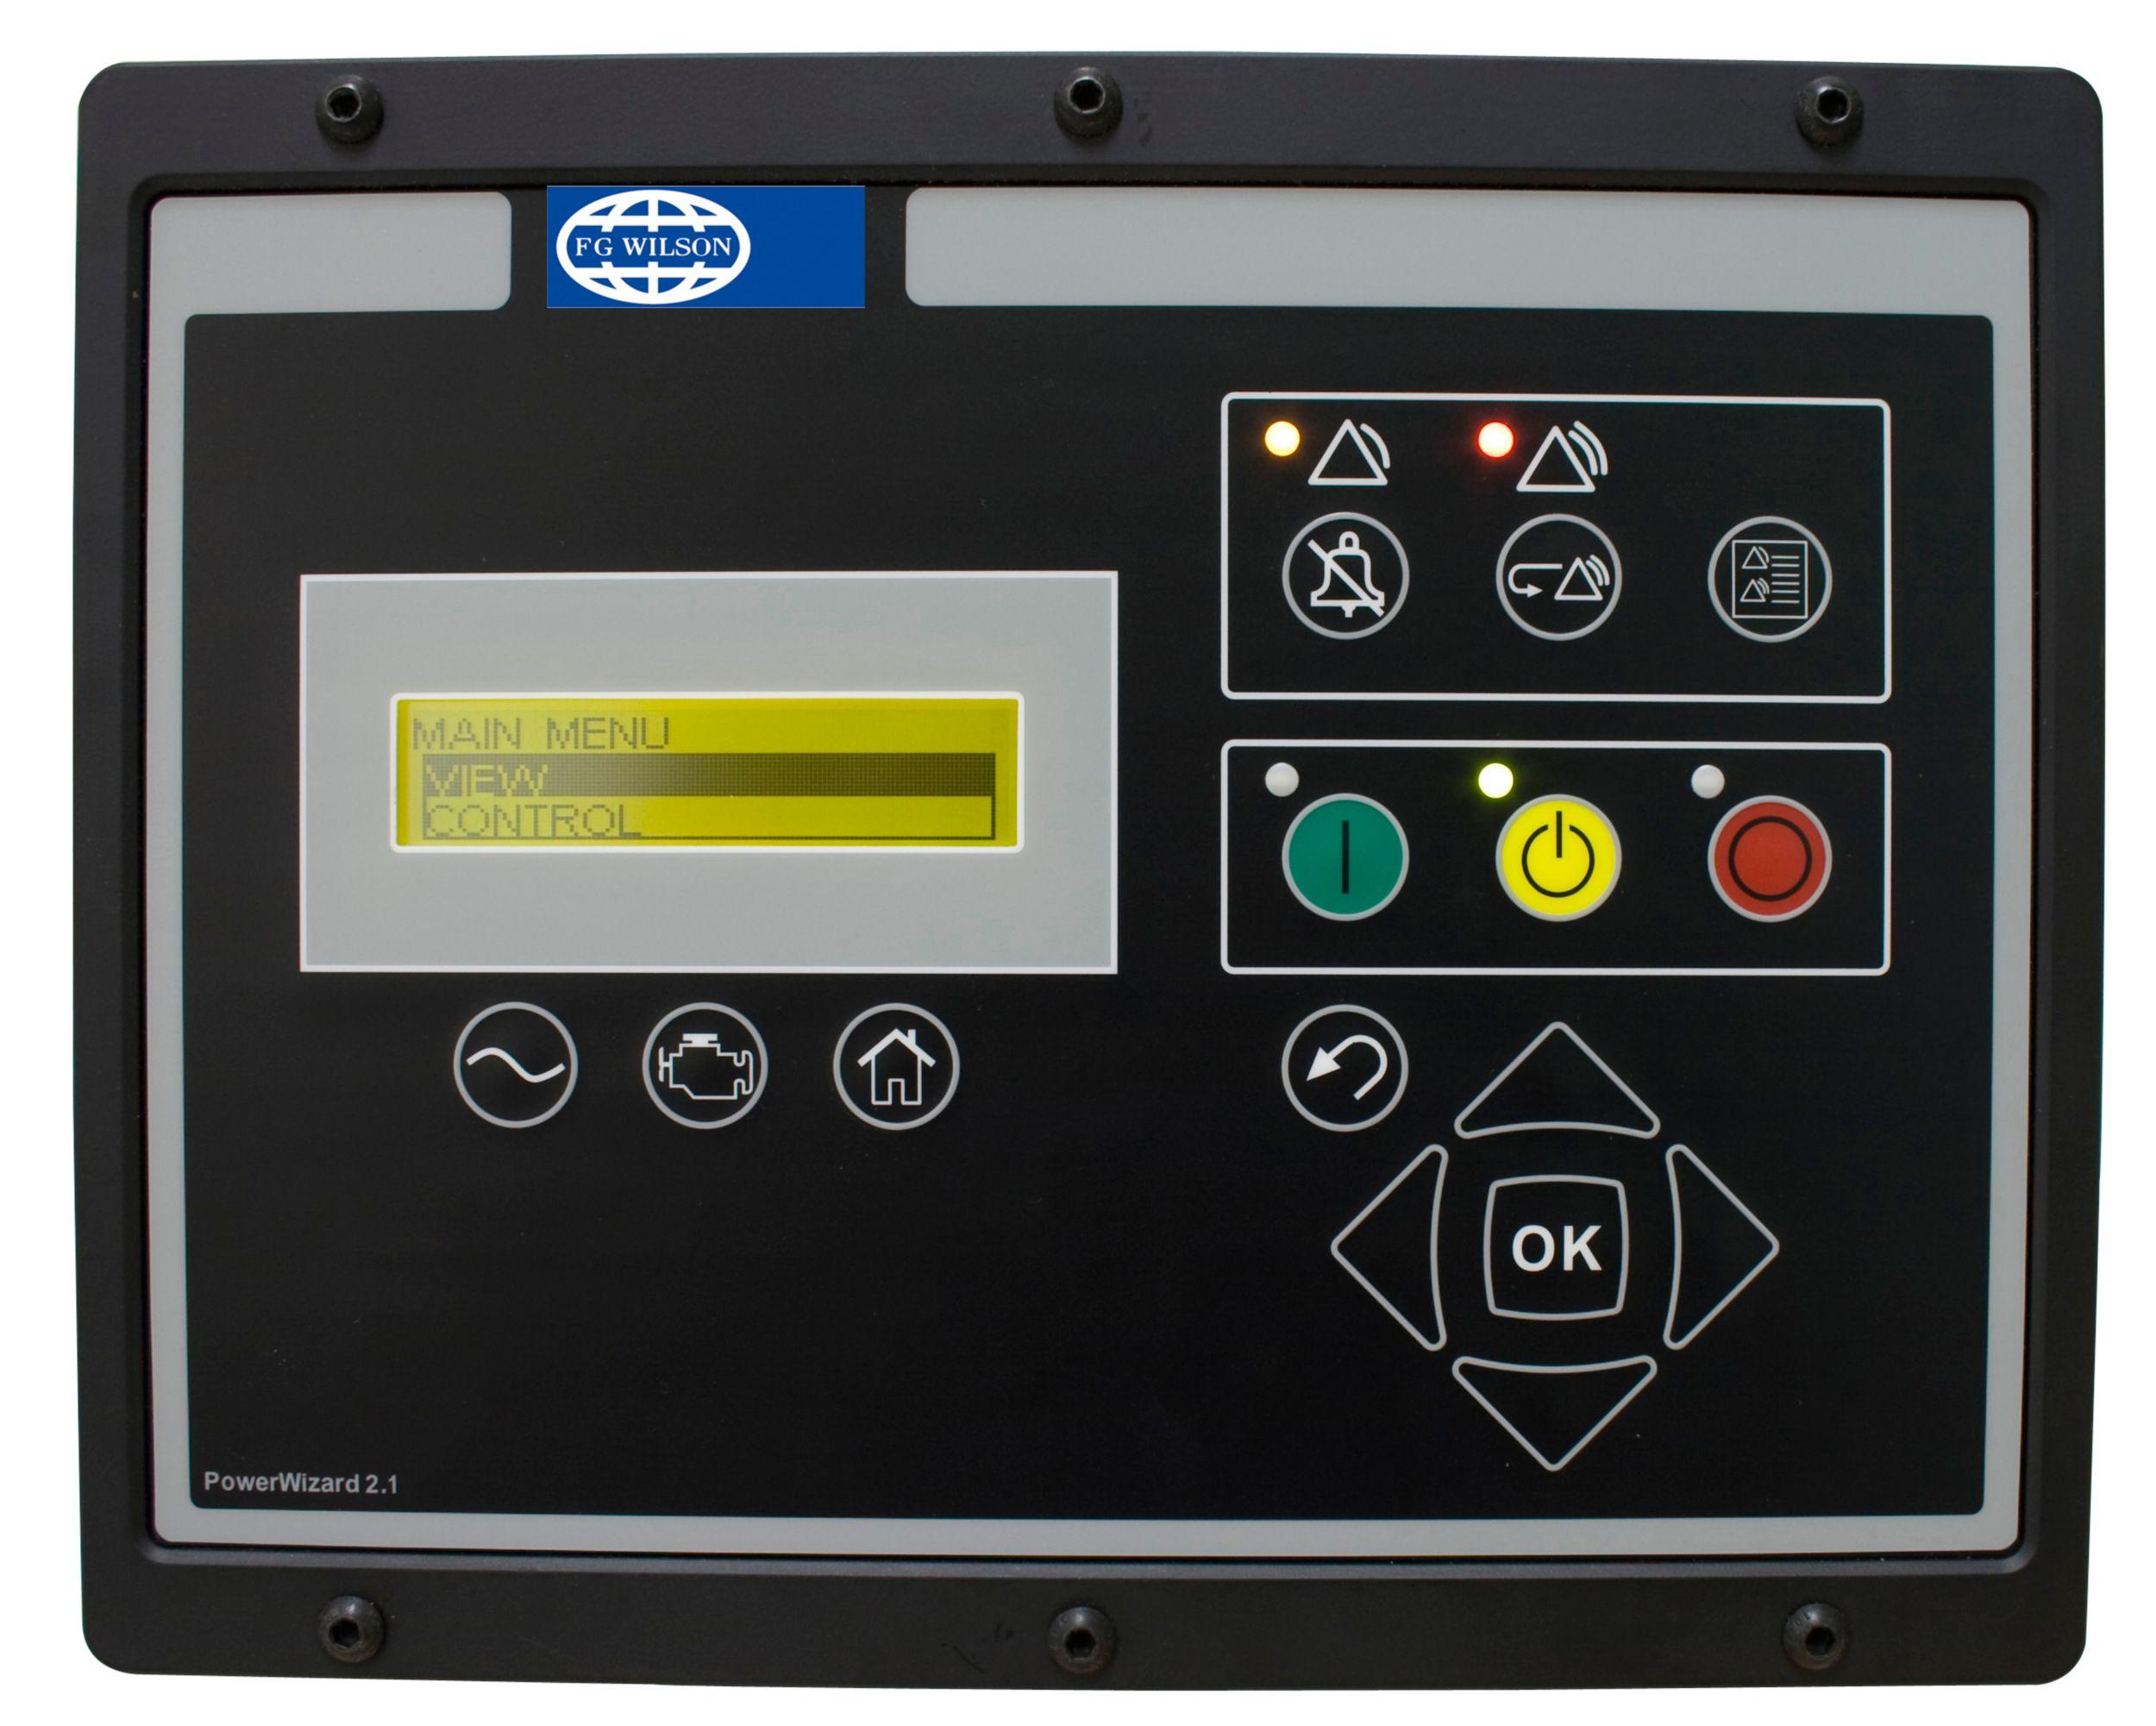 PowerWizard control panel